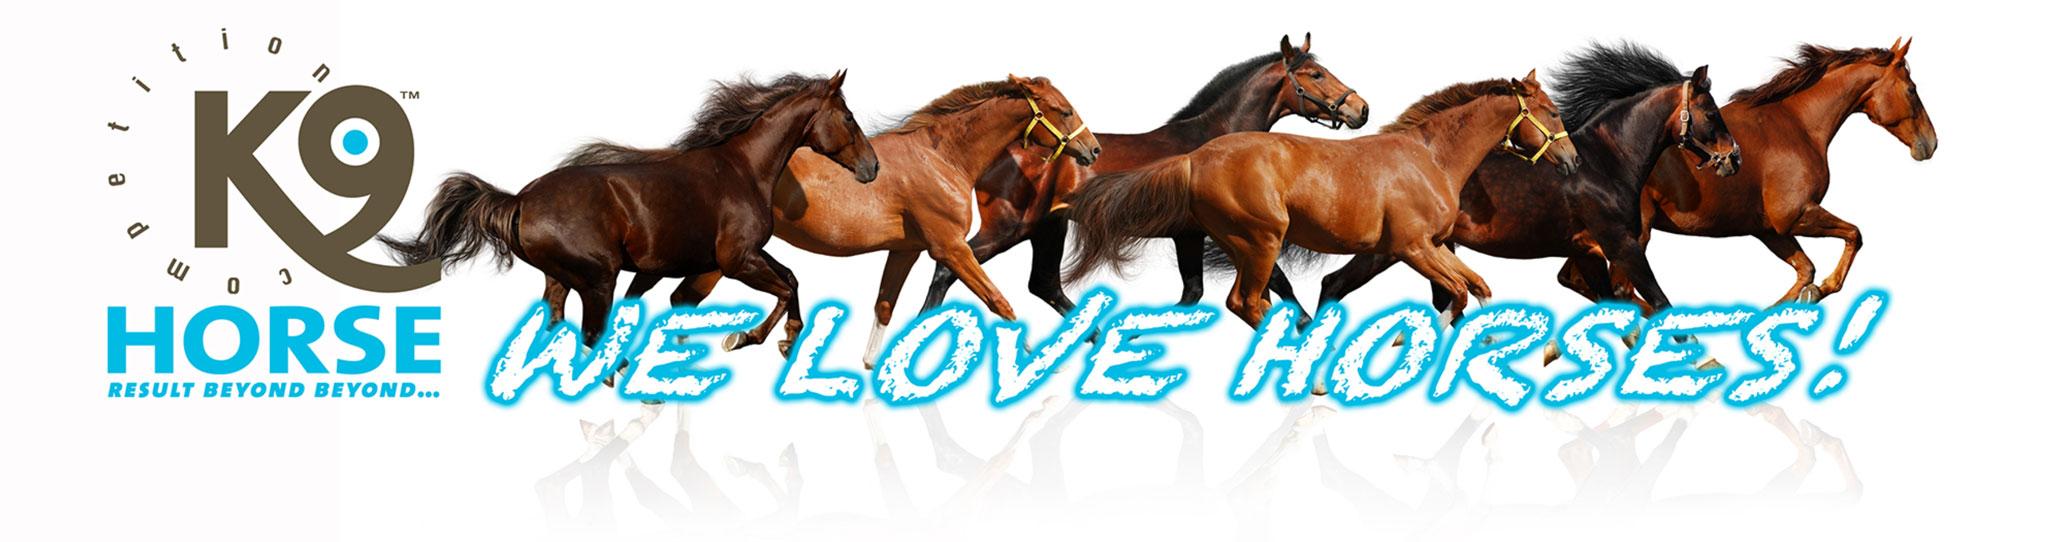 K9 Horse Banner